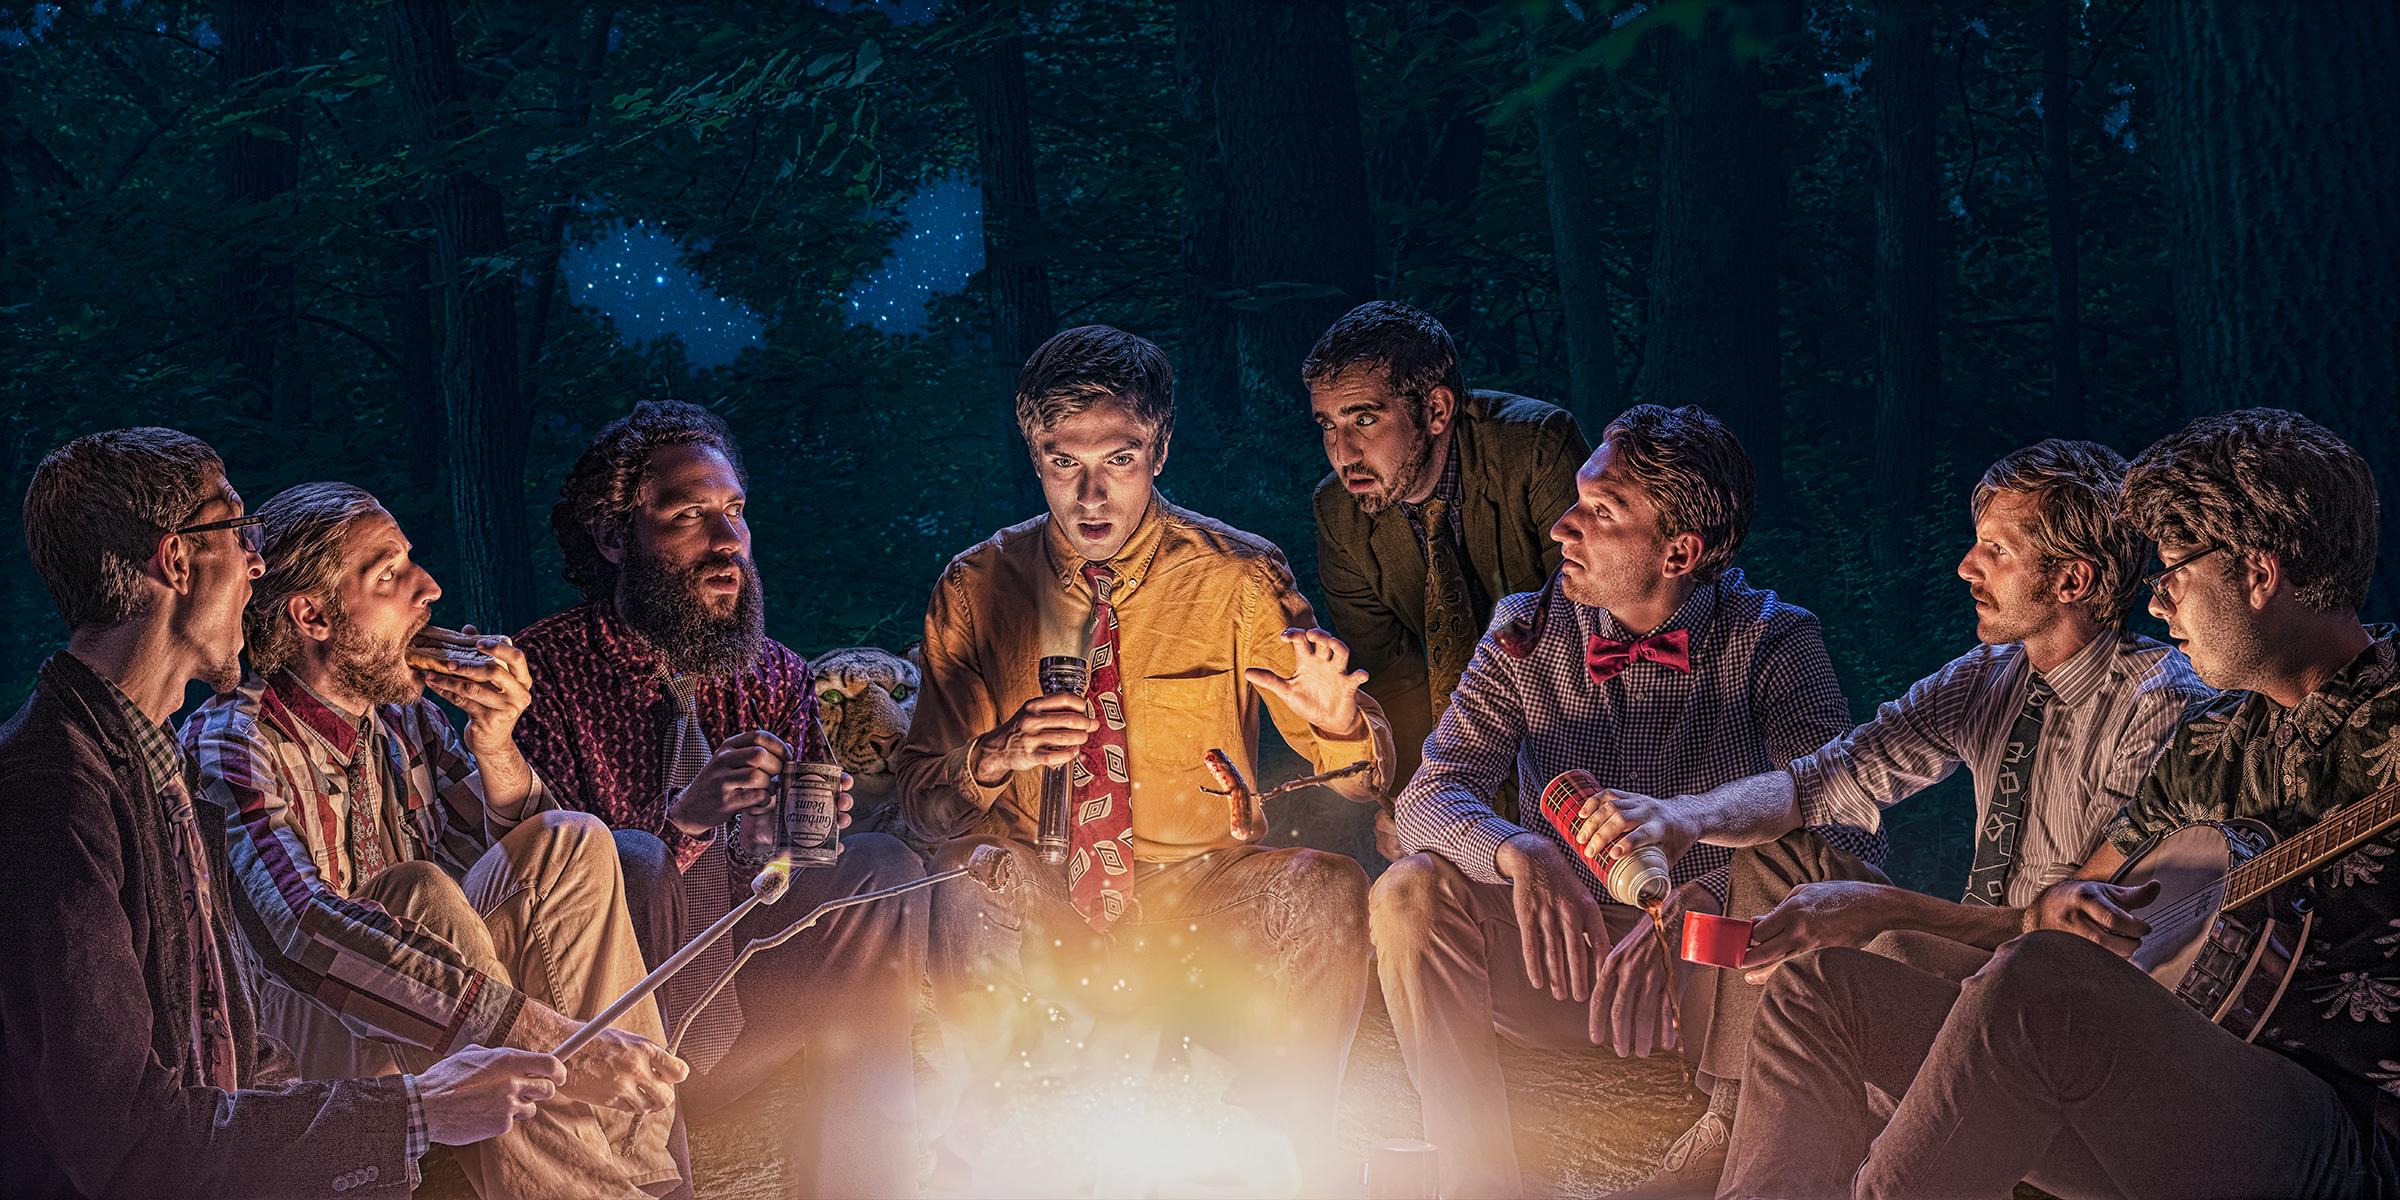 G_the_V_campfire_small.jpg